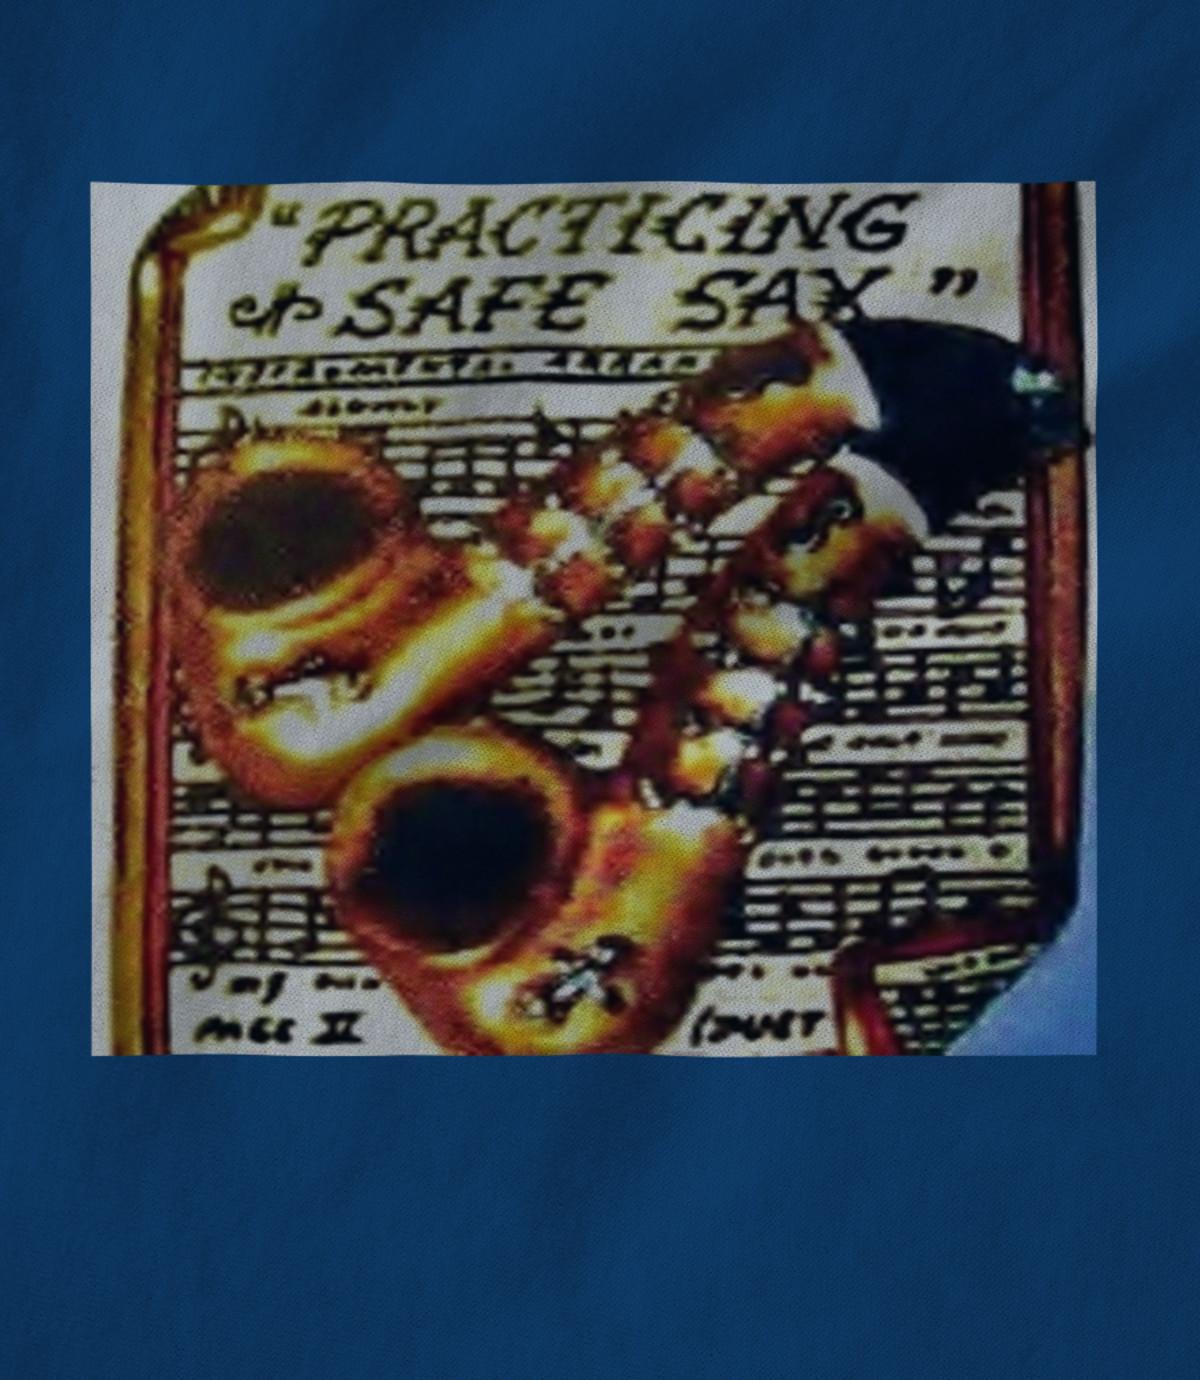 Matthew f  blowers iii practicing safe sax  1505324227